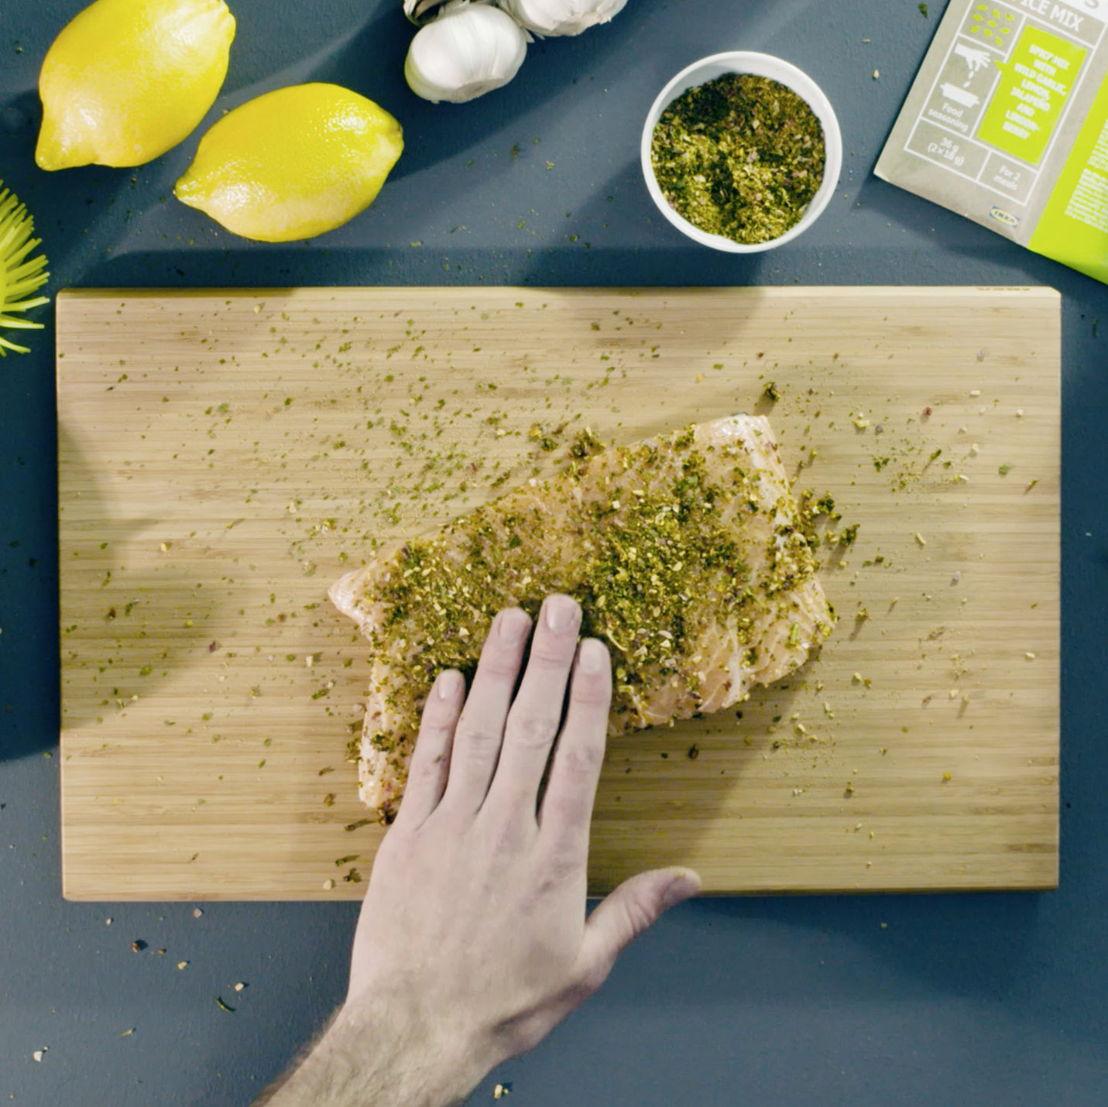 IKEA PS 2017 spice mix